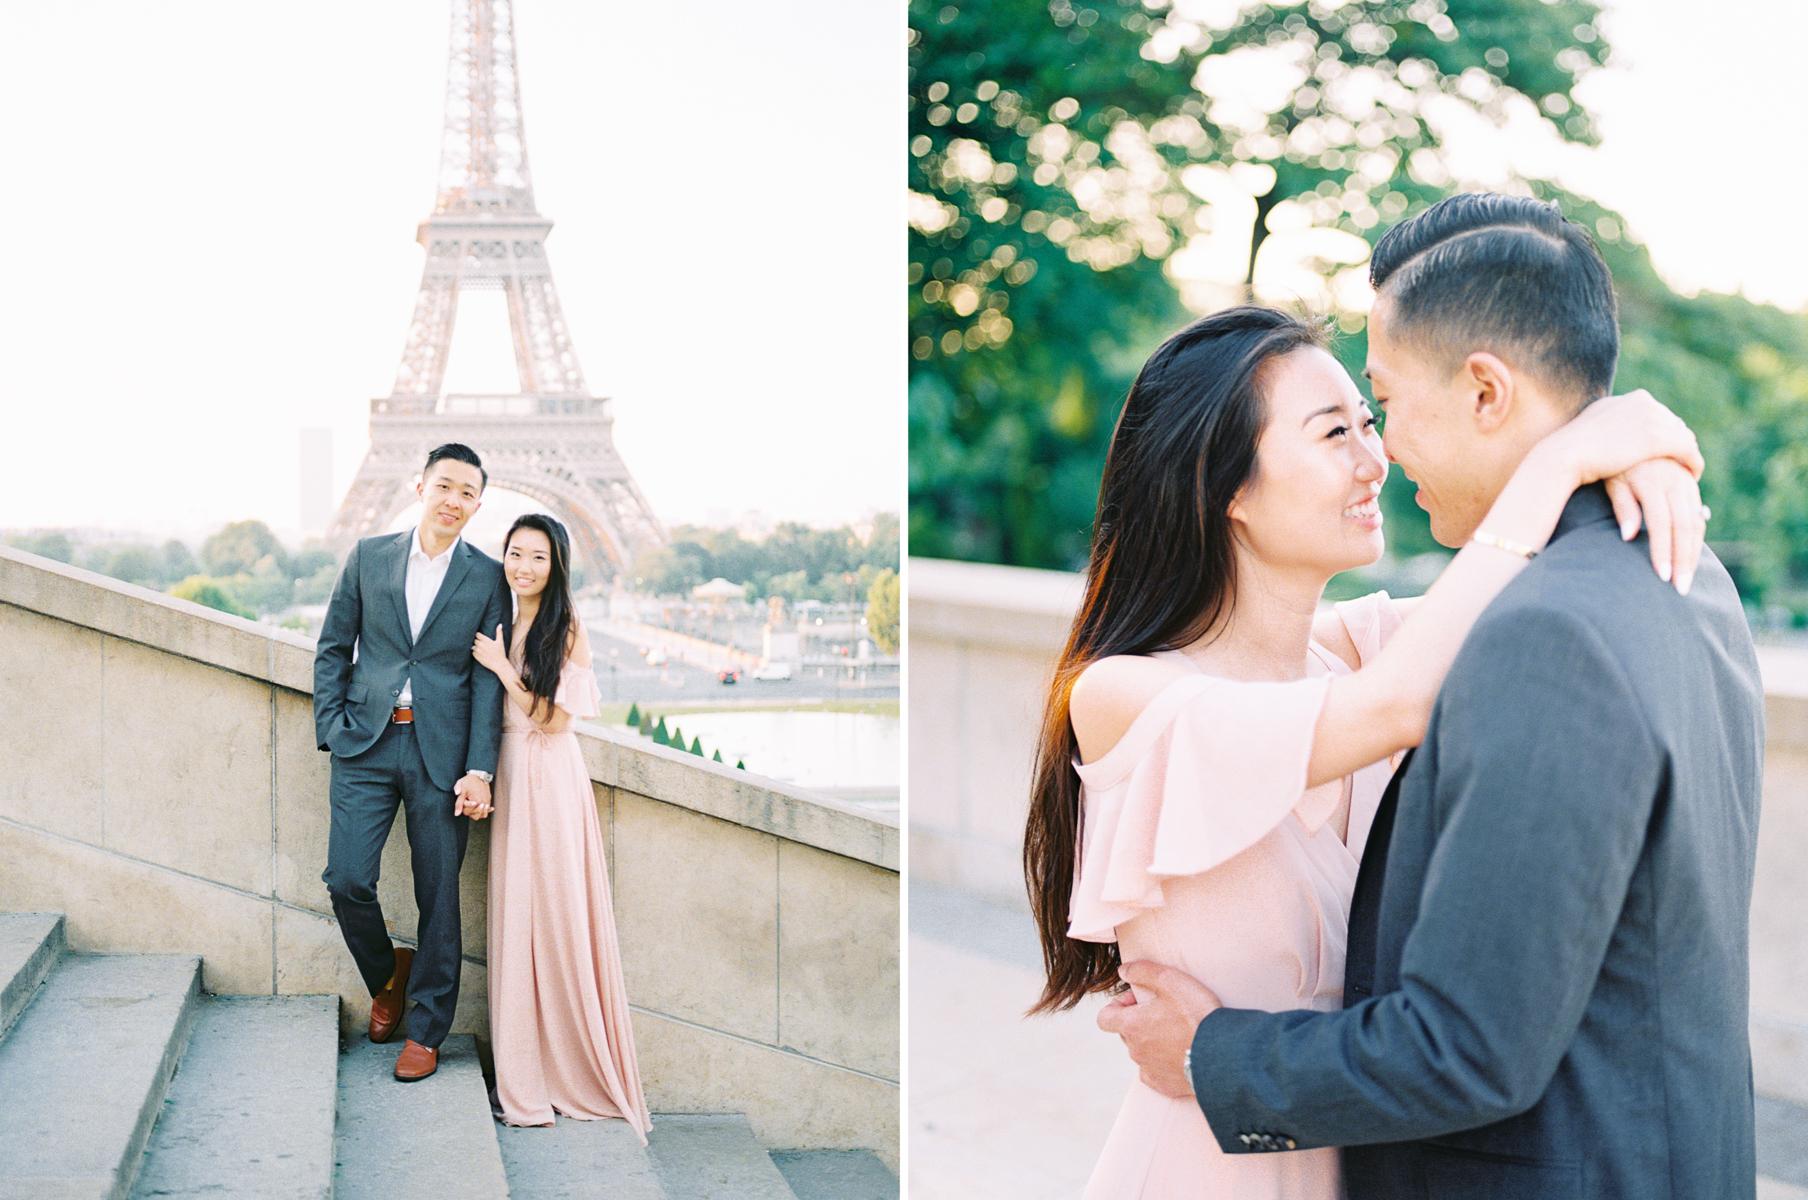 AKP_Paris_Honeymoon_Shoot_Film_Photographer-1.jpg